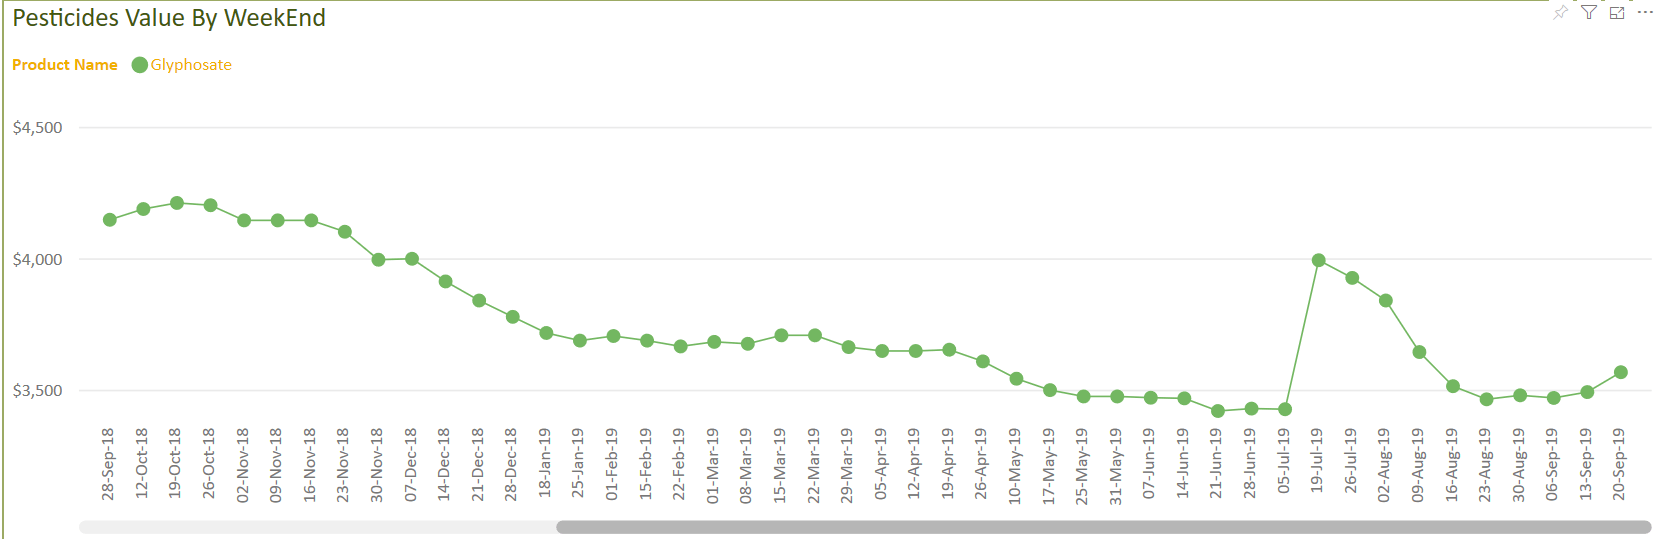 Glyphosate value in USD